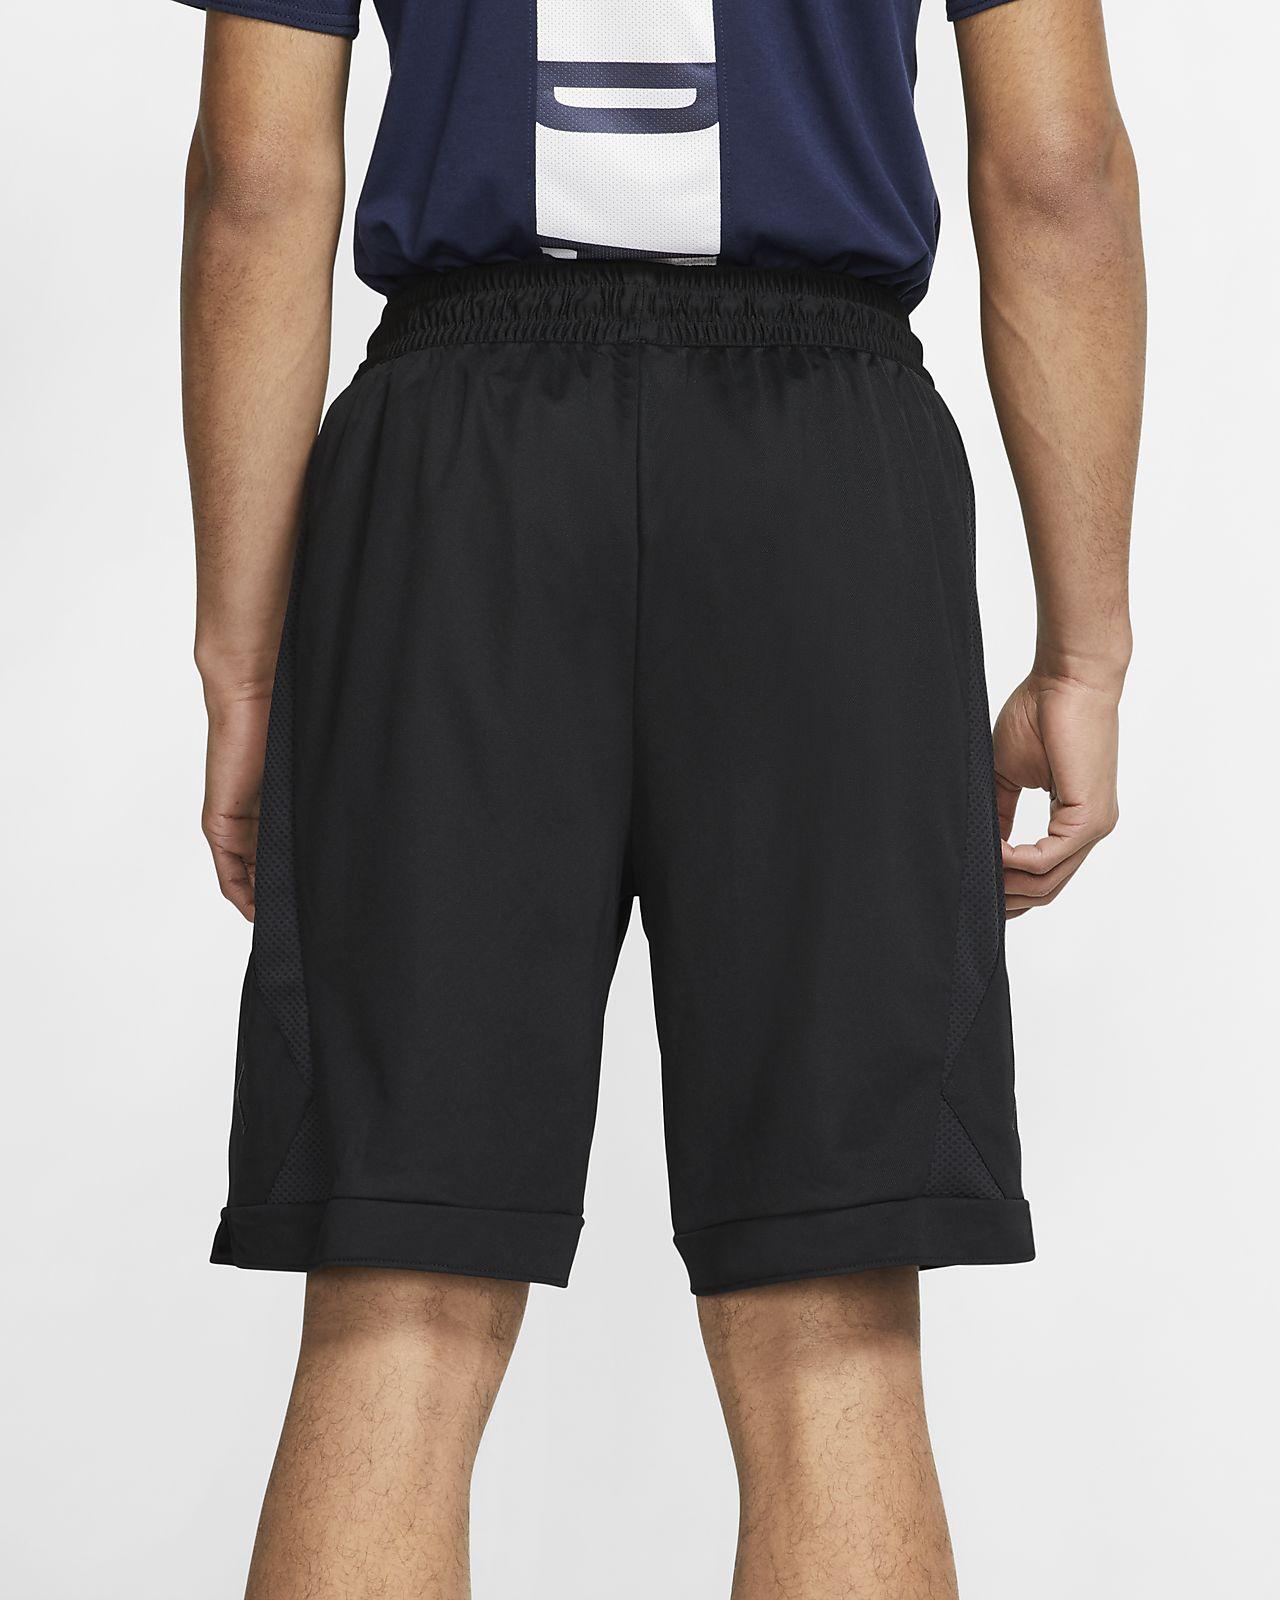 5ea6c08a0af6 Jordan Authentic Triangle Men s Basketball Shorts. Nike.com